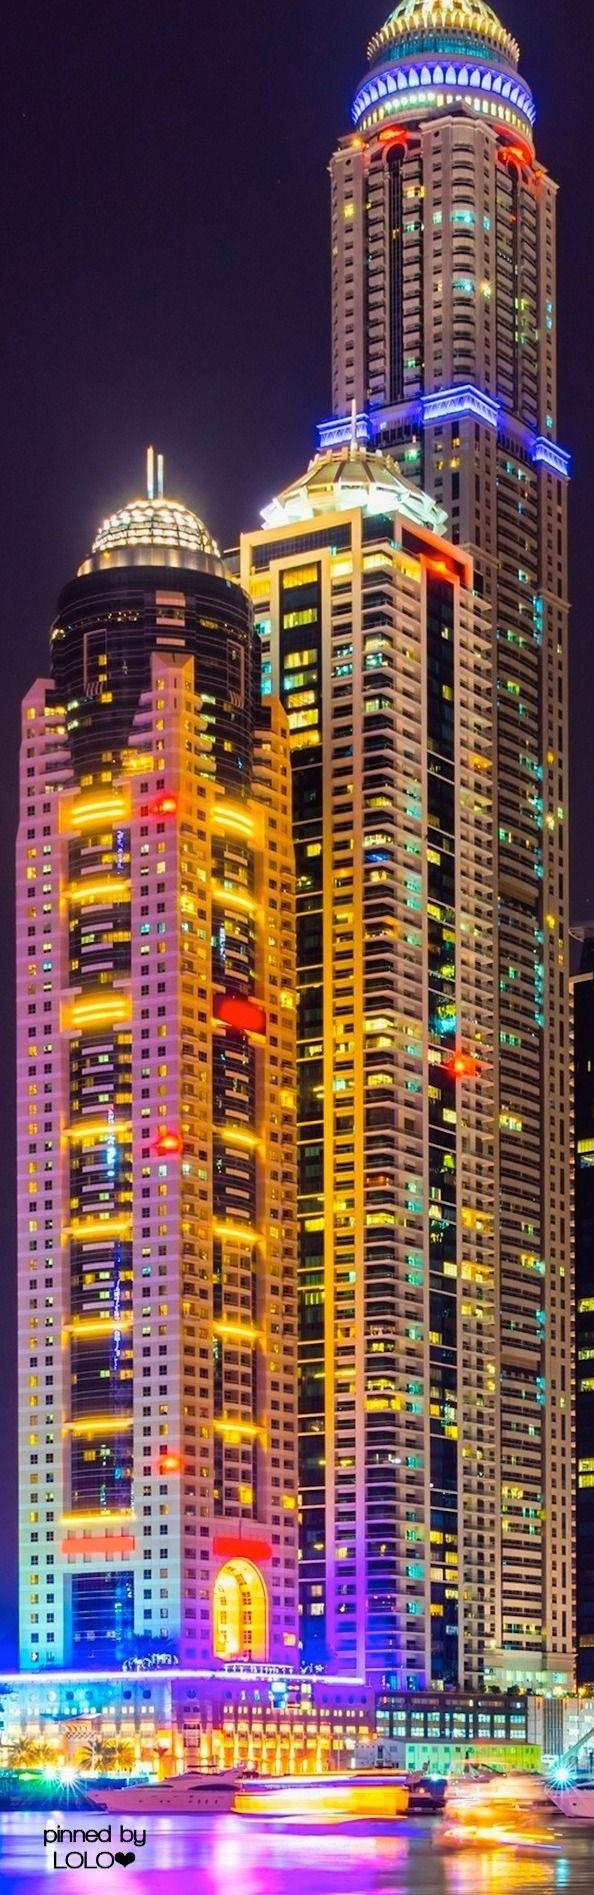 Vacationing in Dubai. https://www.facebook.com/pages/Sexi/1402482520062913?ref=hl @Davids0503 https://www.facebook.com/pages/Disfruta-el-Momento-Enjoy-the-Moment/750346691726285?ref=hl